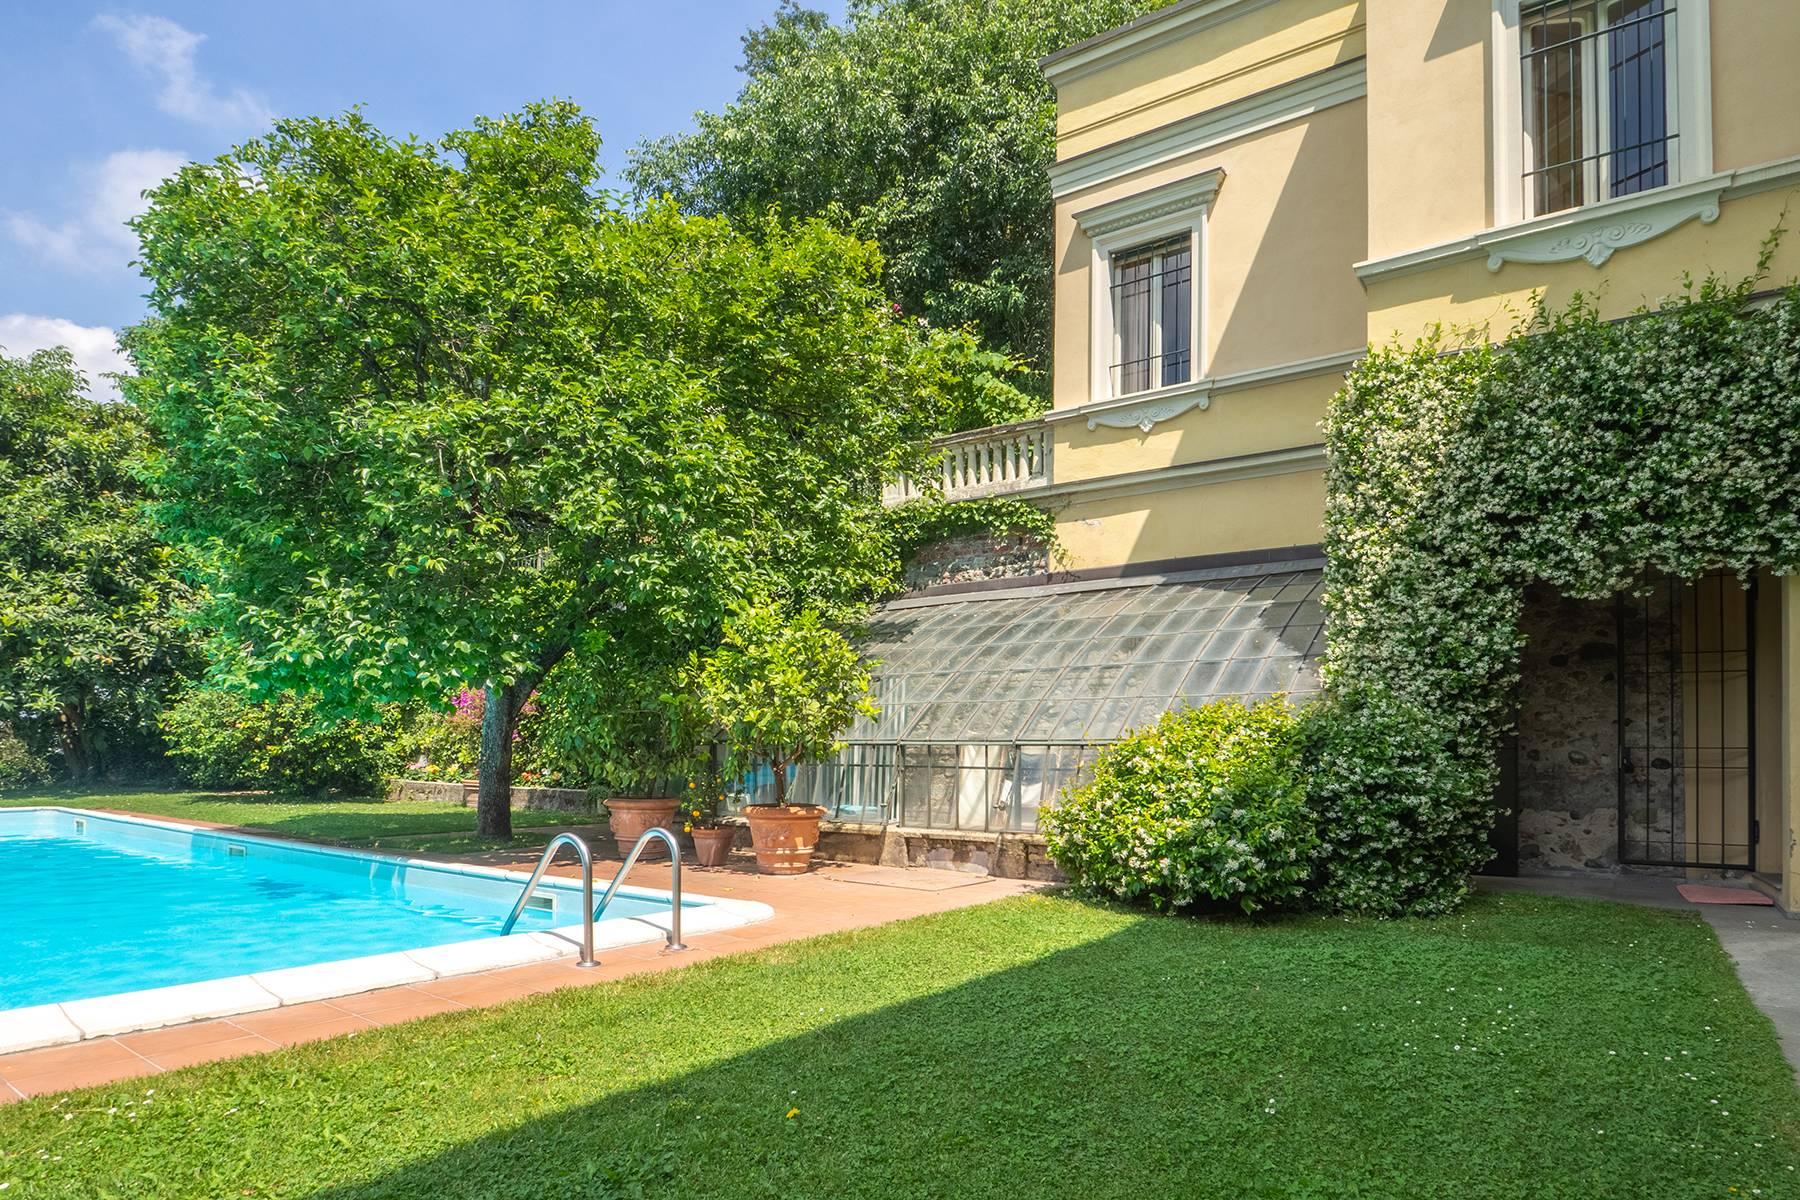 Casa indipendente in Vendita a Torino: 5 locali, 657 mq - Foto 20